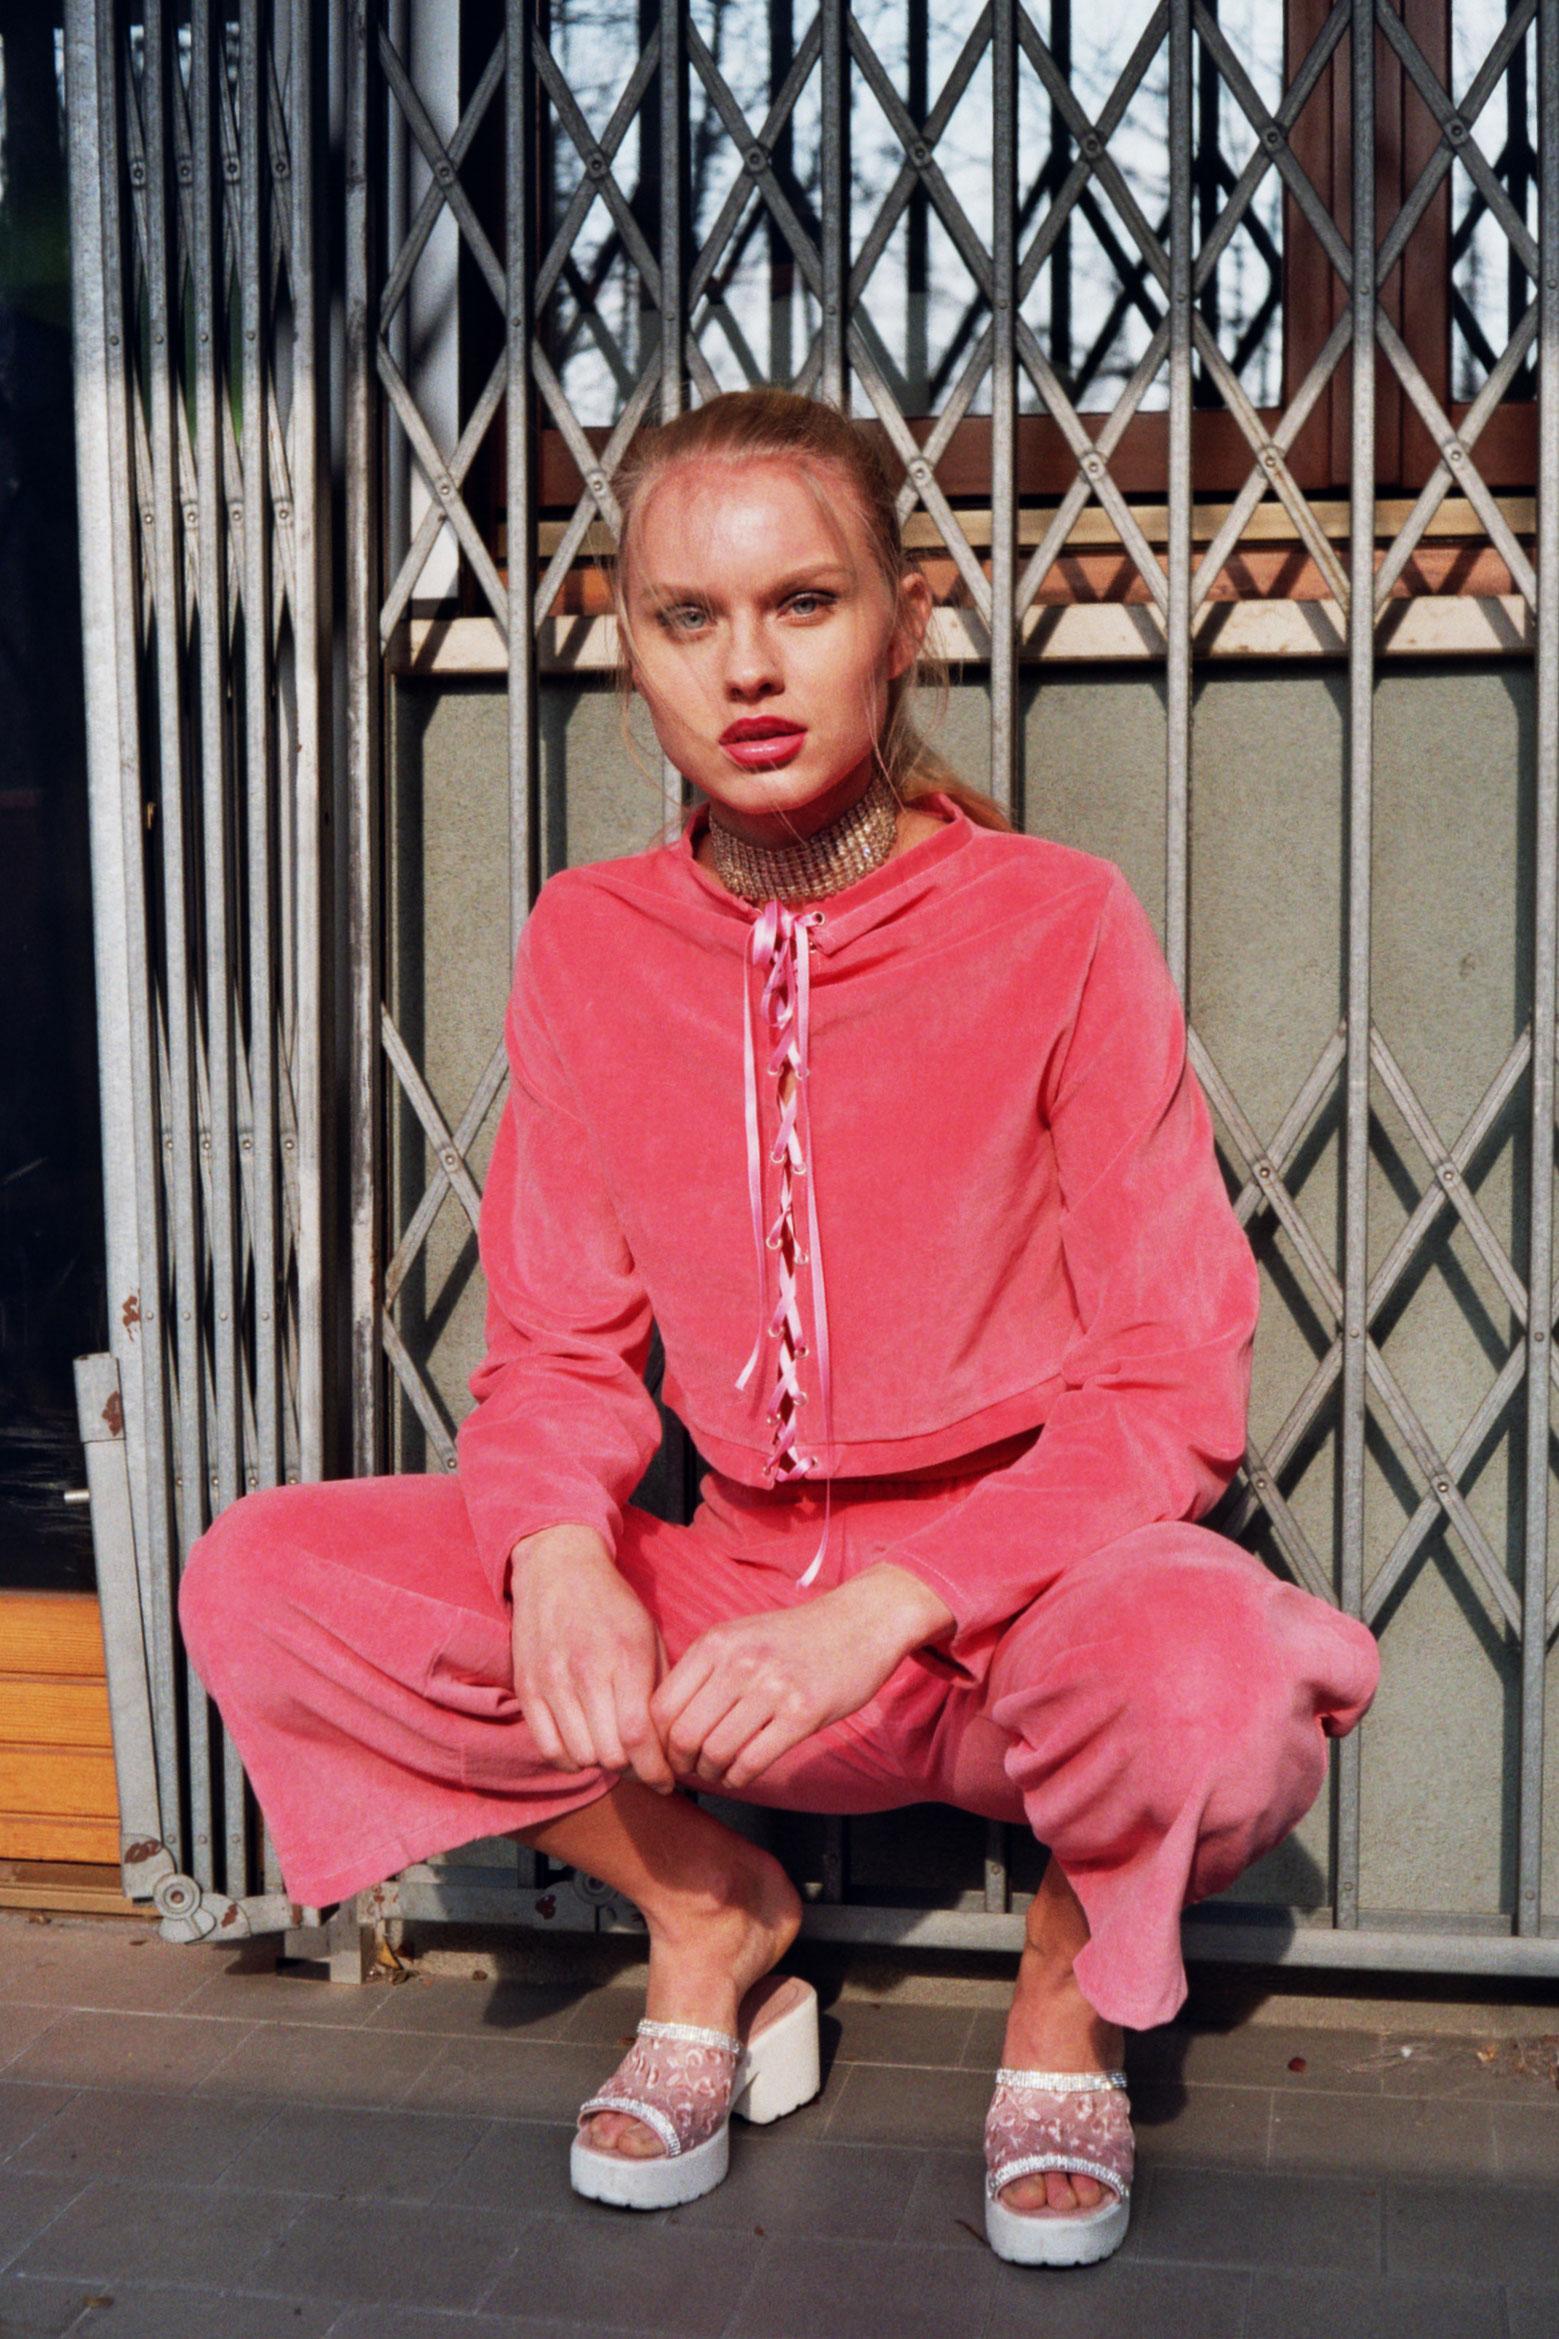 shirt + trousers MARLEY ALBA, shoes + chocker VINTAGE MARKET